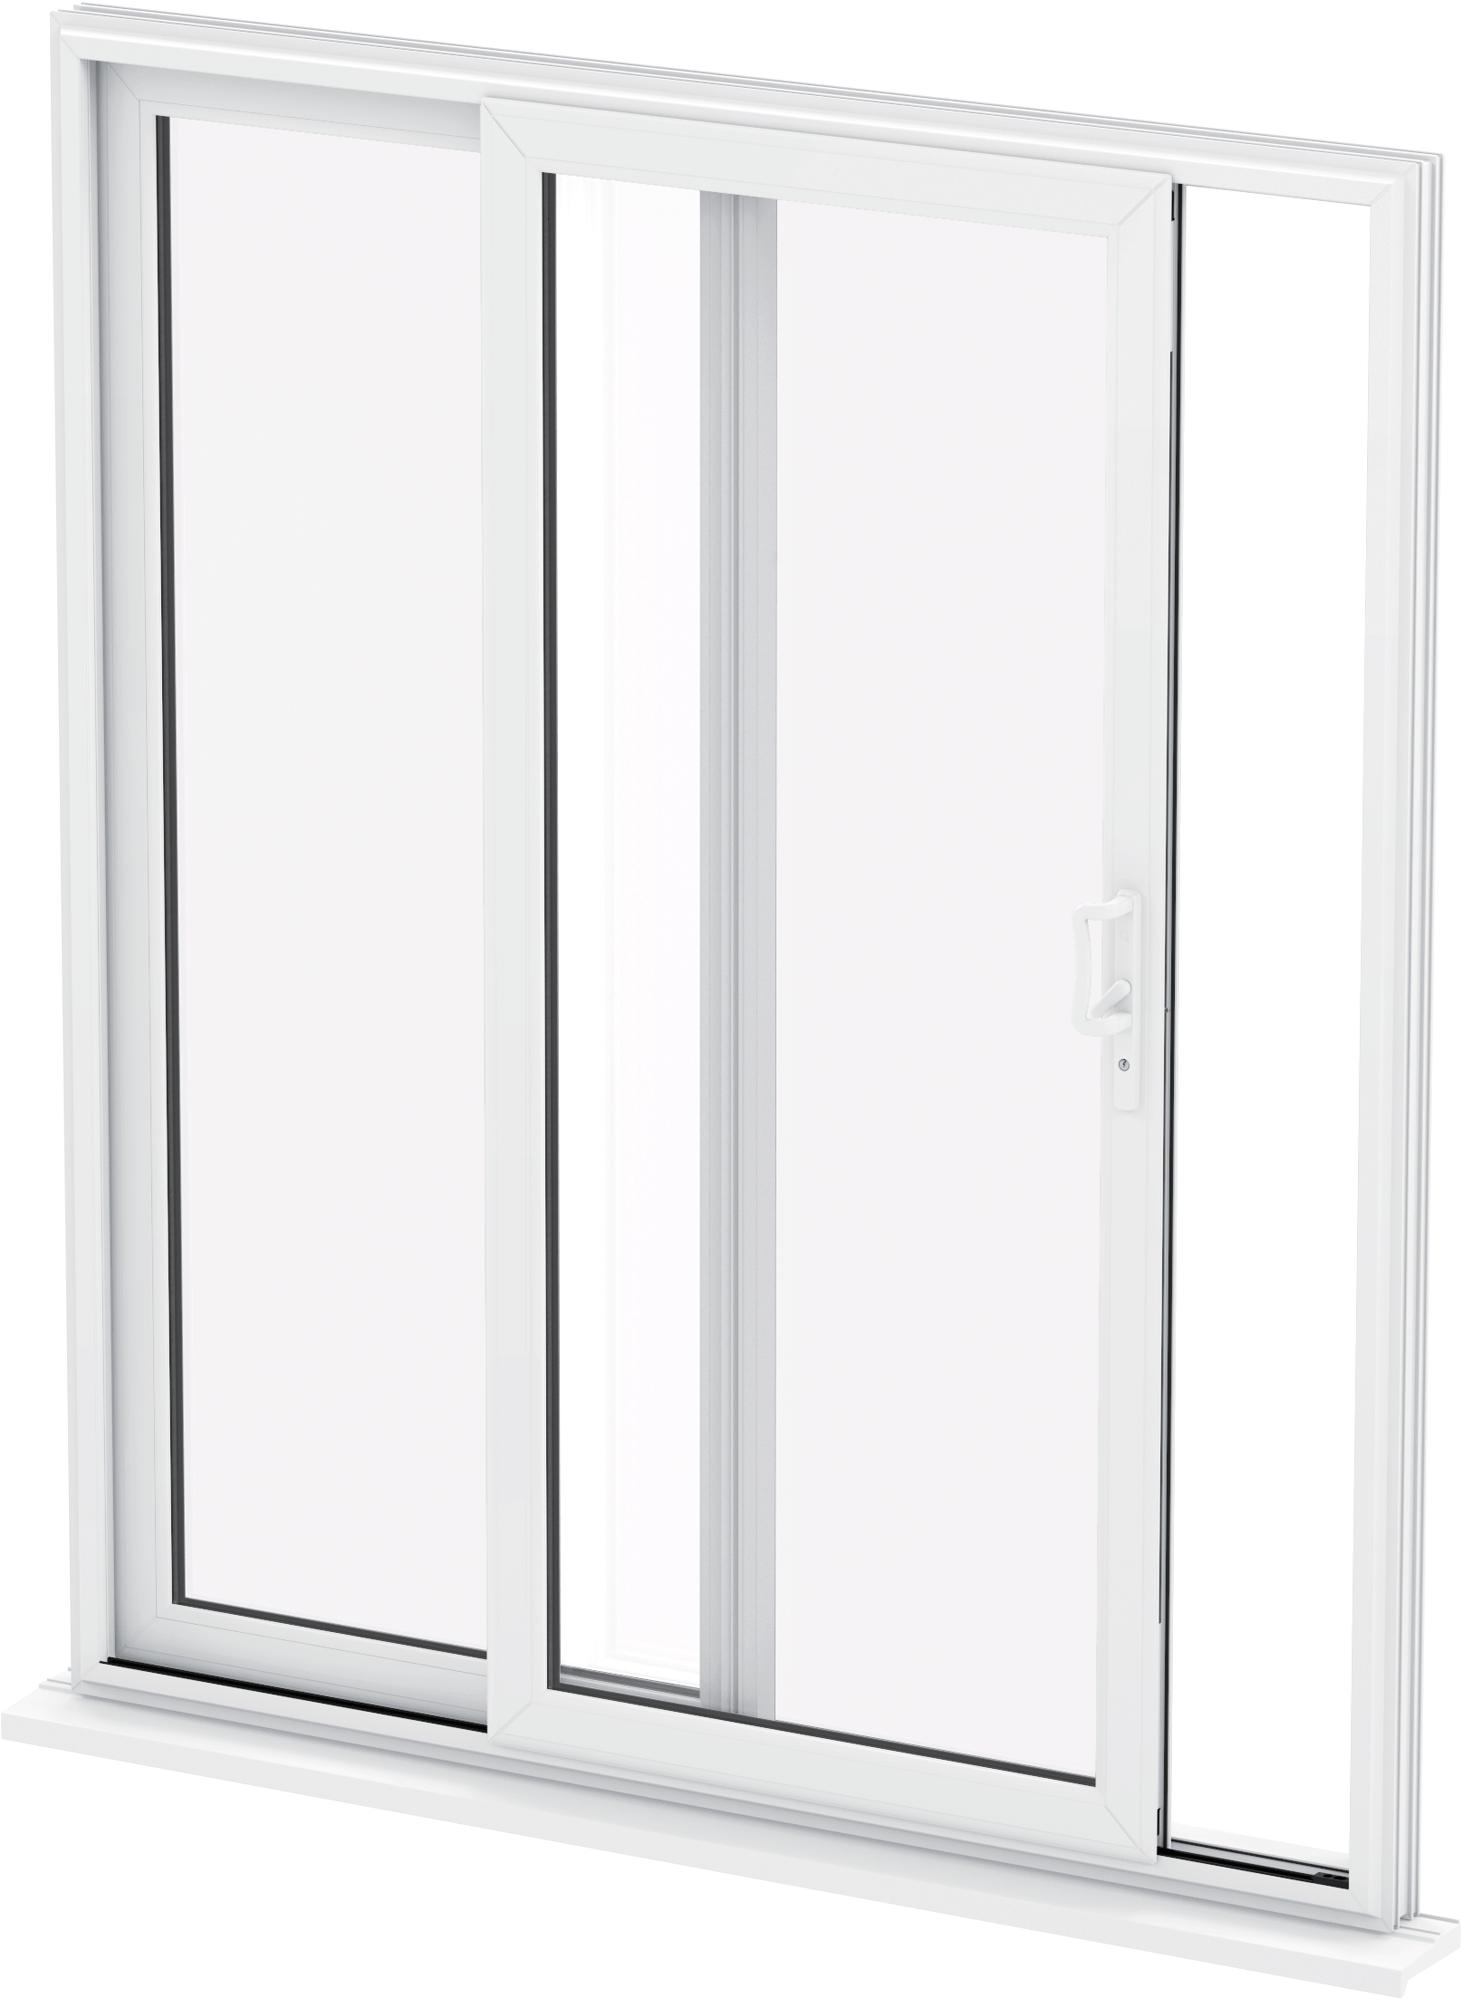 Southgate windows upvc patio doors trade bridgwater bristol upvc patio doors rubansaba